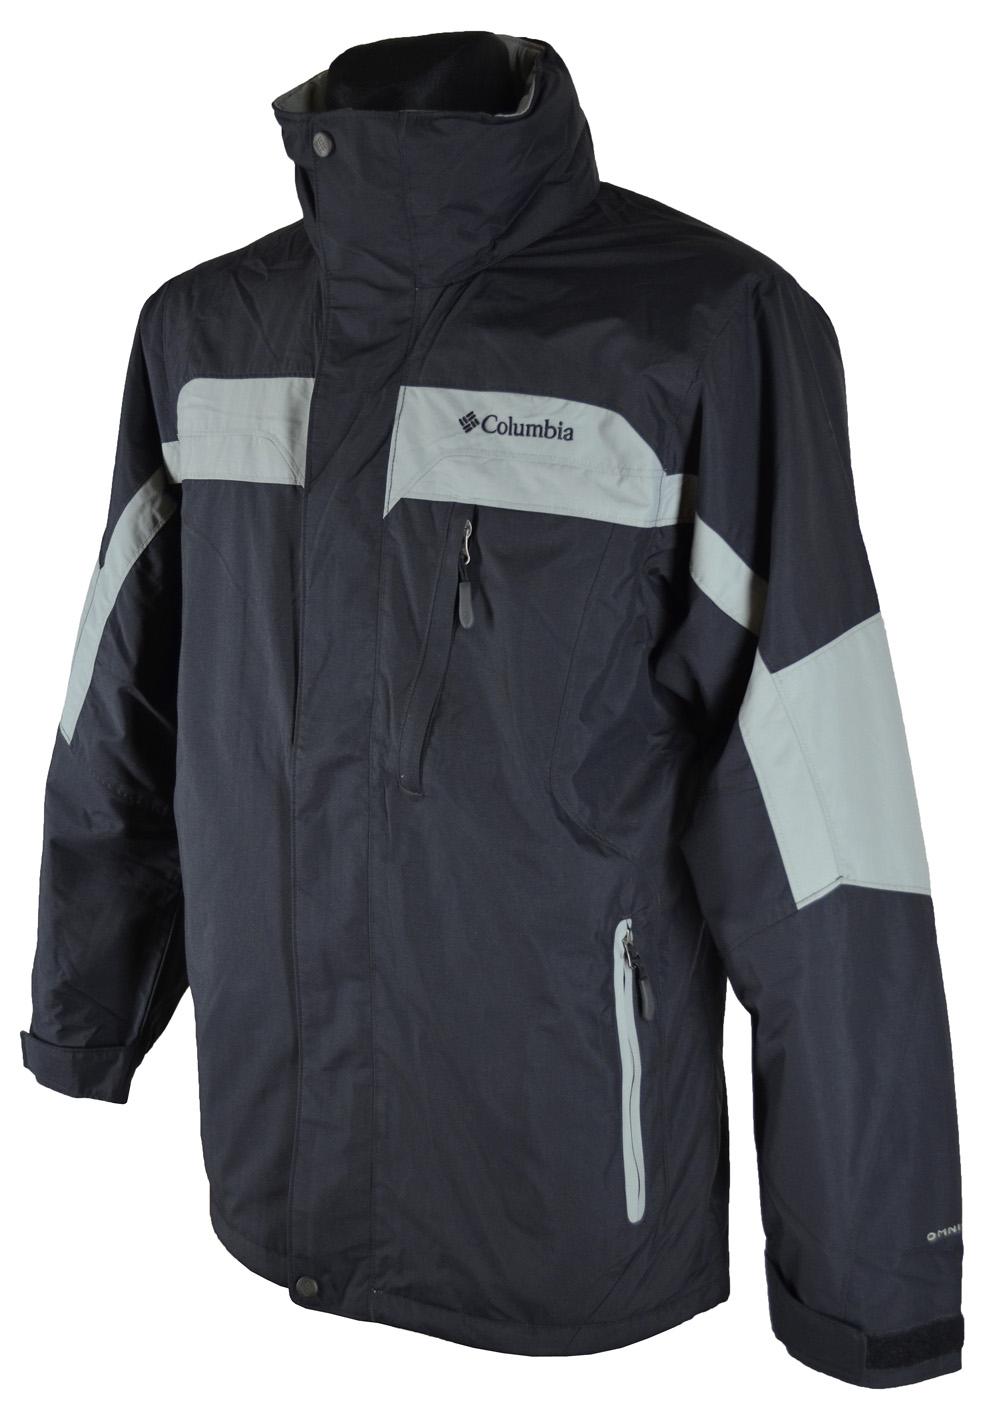 Columbia Киев - мужские куртки, пуховики Columbia Omni Heat купить в ... 34f2f03b71a